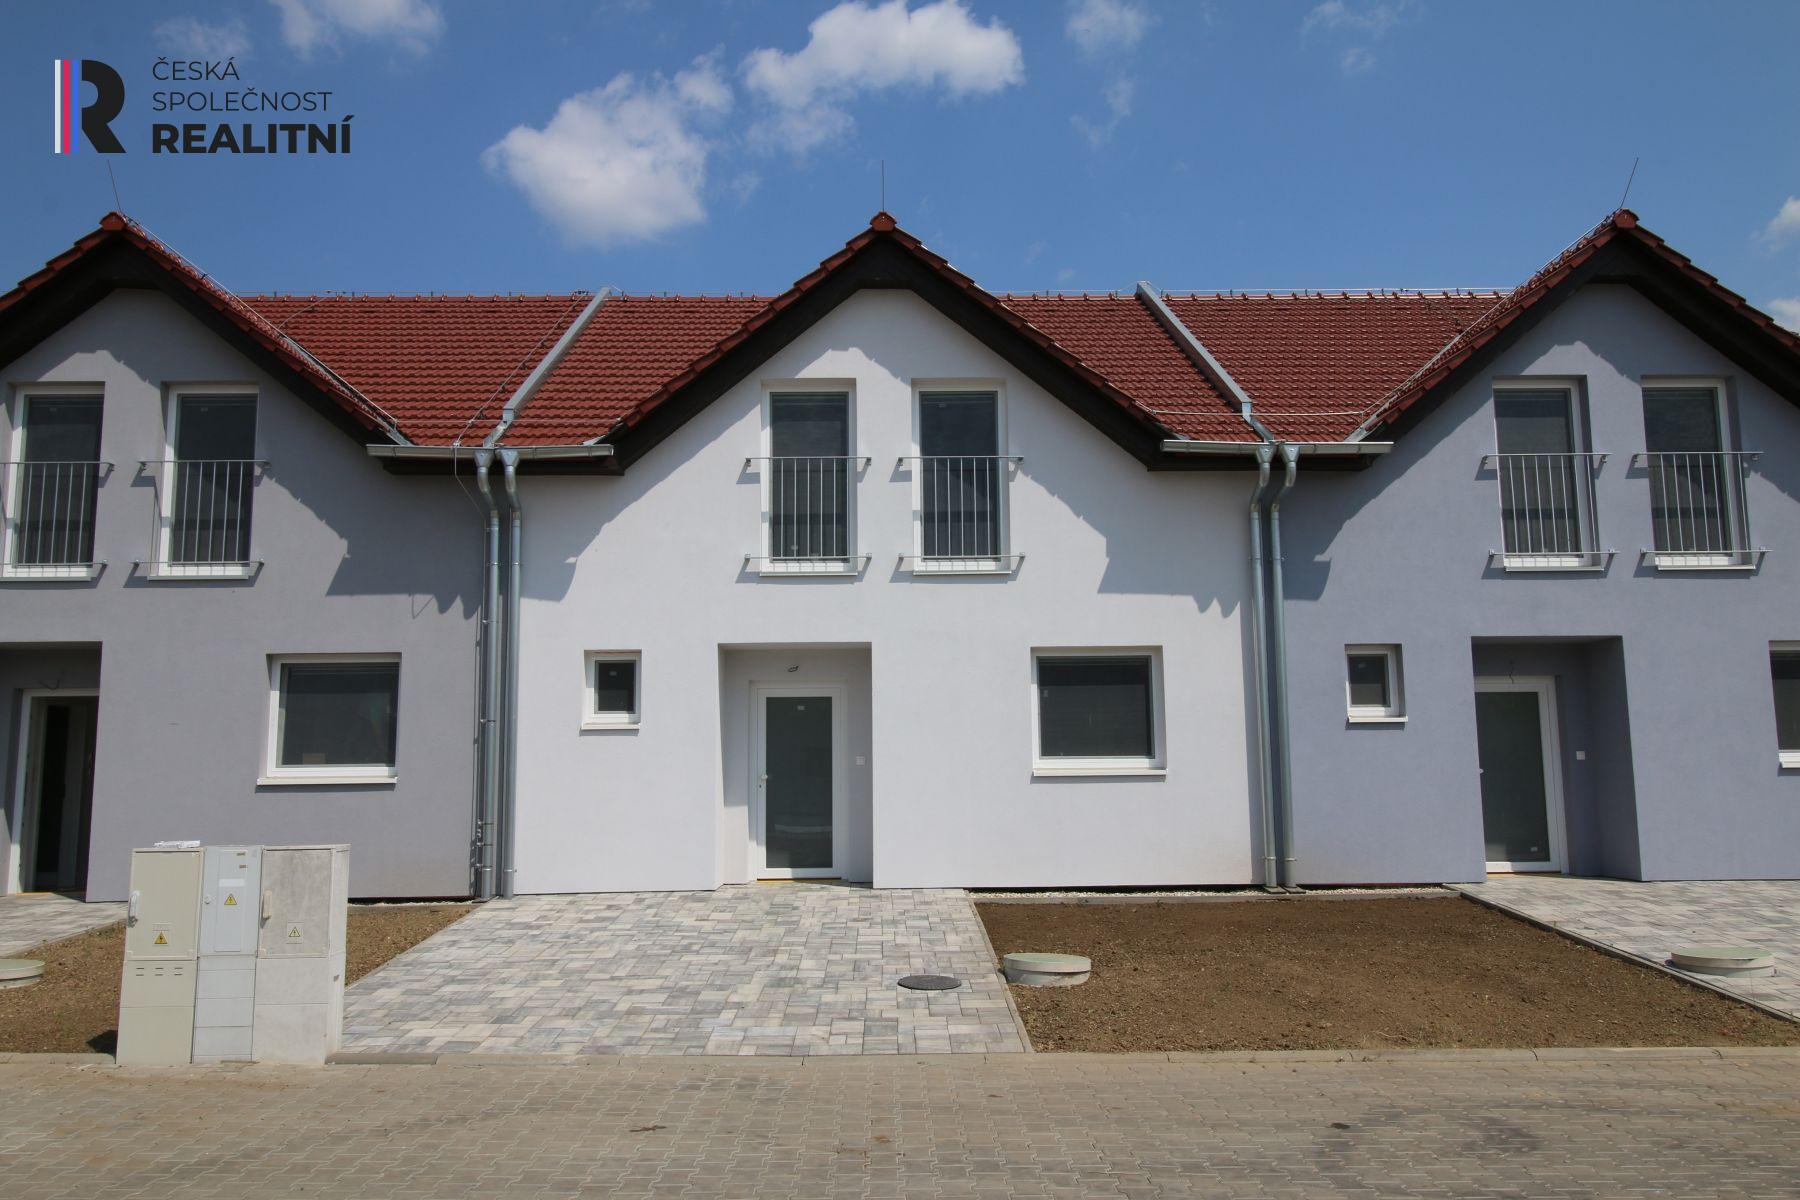 Rodinný dům 4 kk, Holasice, pozemek 249 m2, novostavba